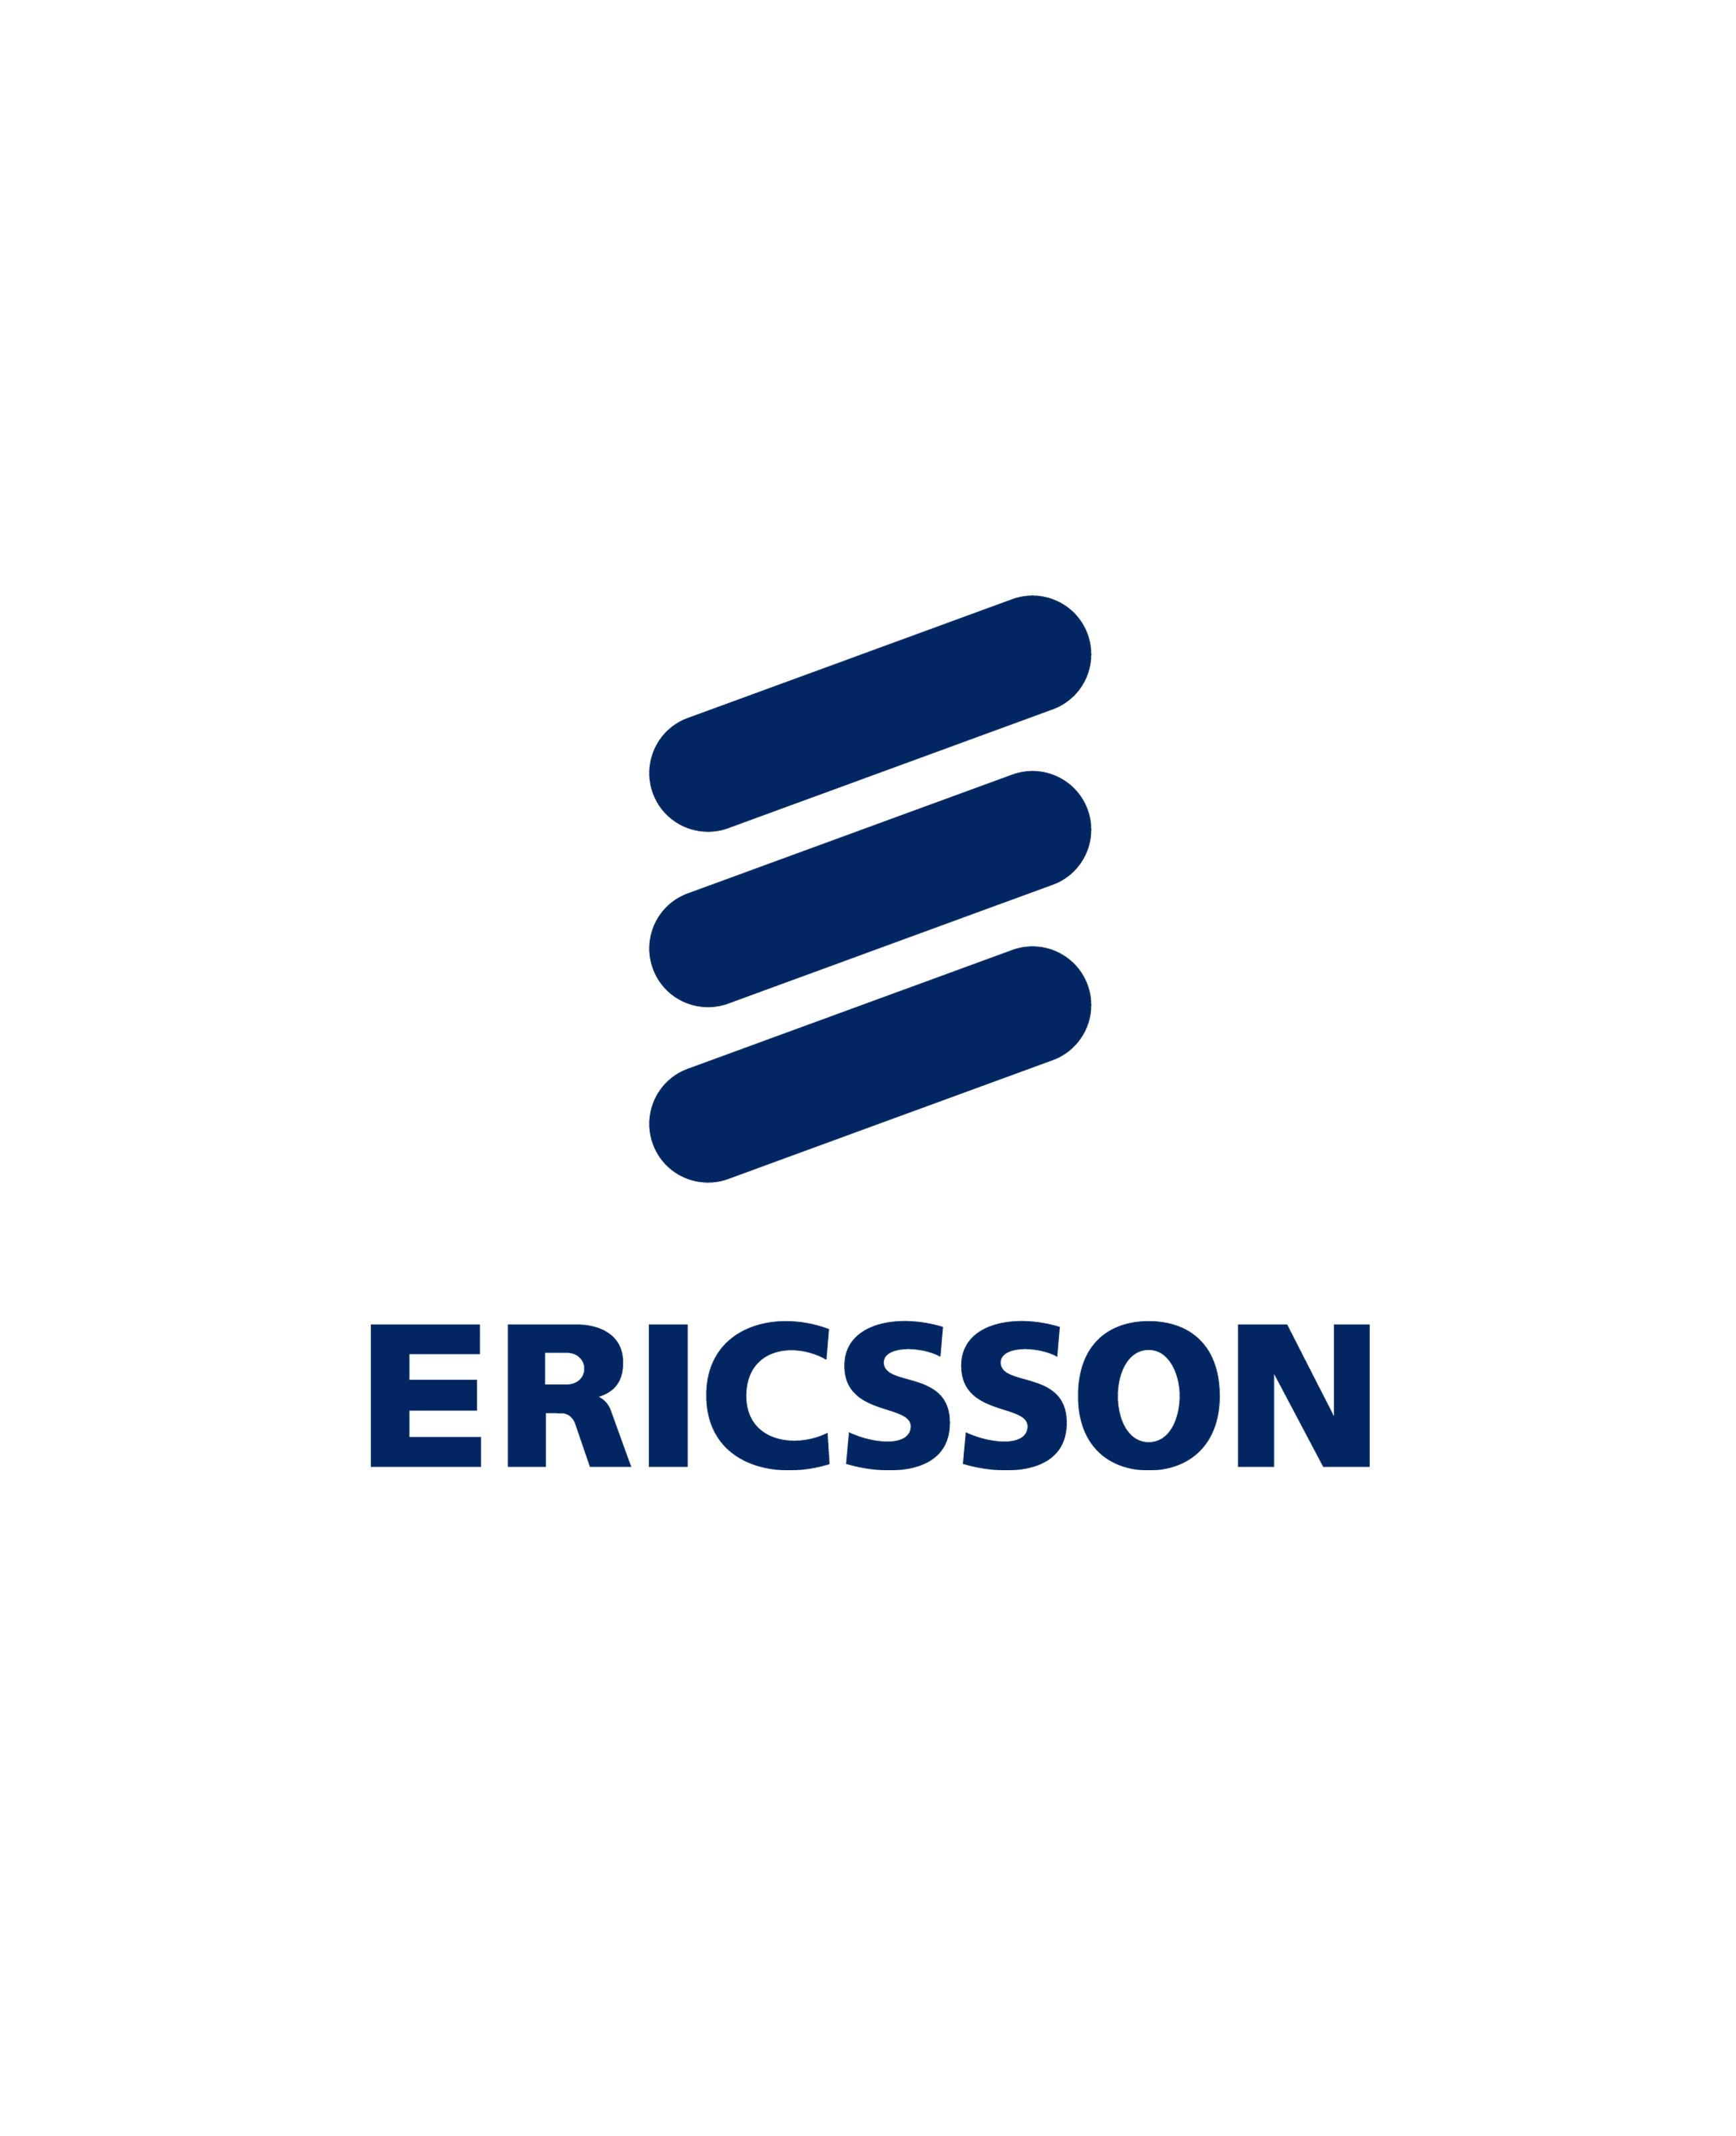 Ericsson_Logo_Vertical_Blue_HighQ